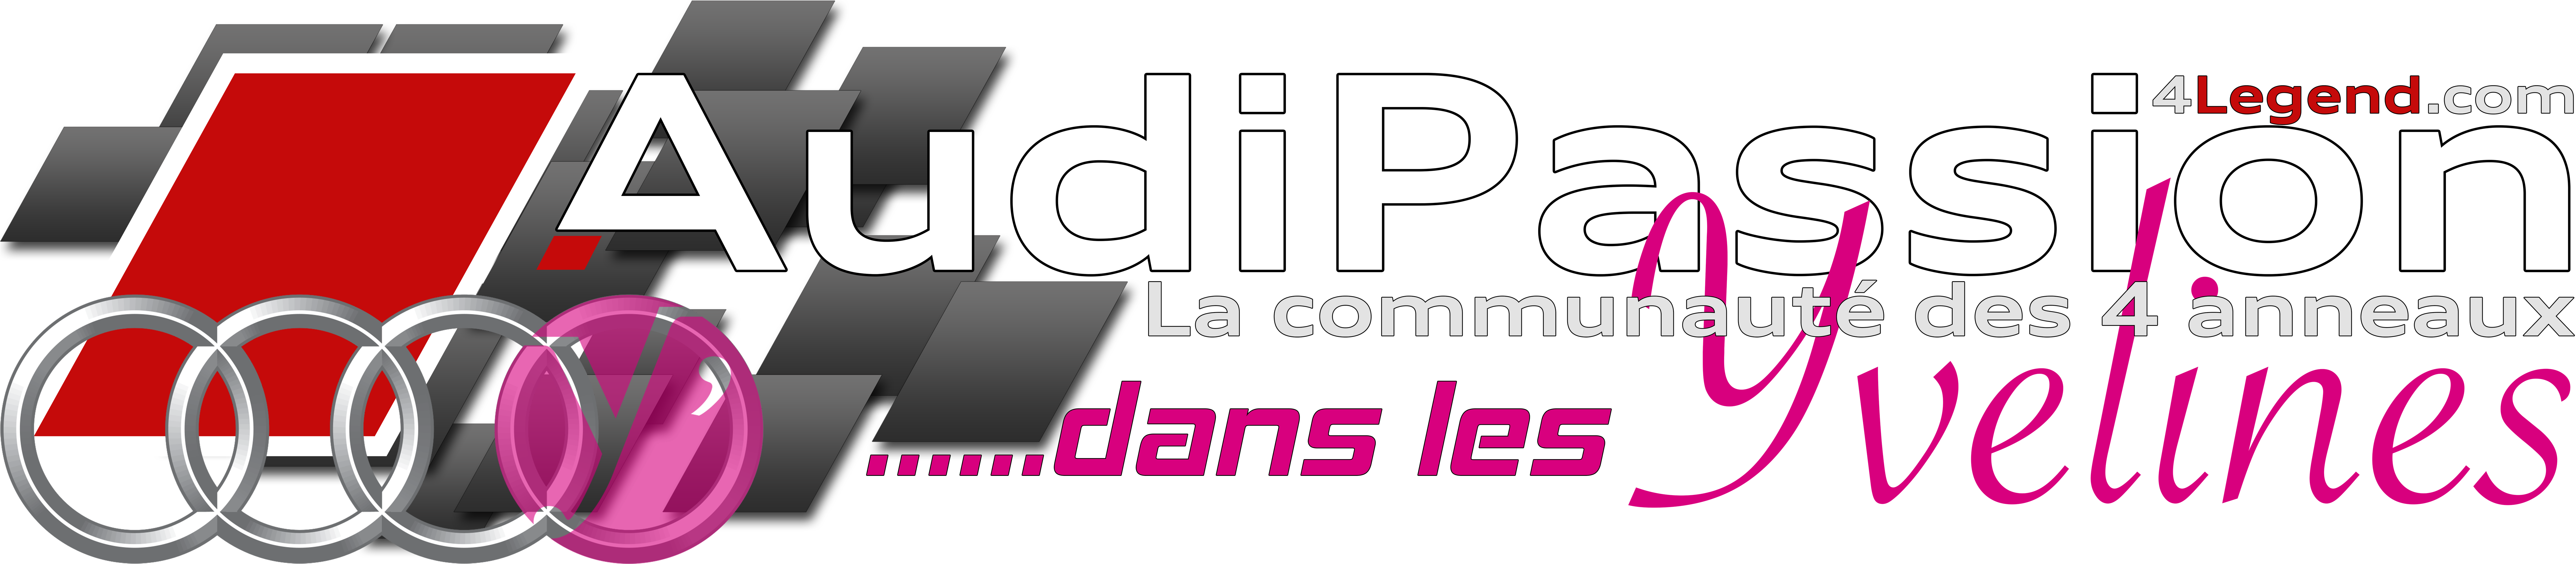 AP_Logo_000_8000px_Transparent.png